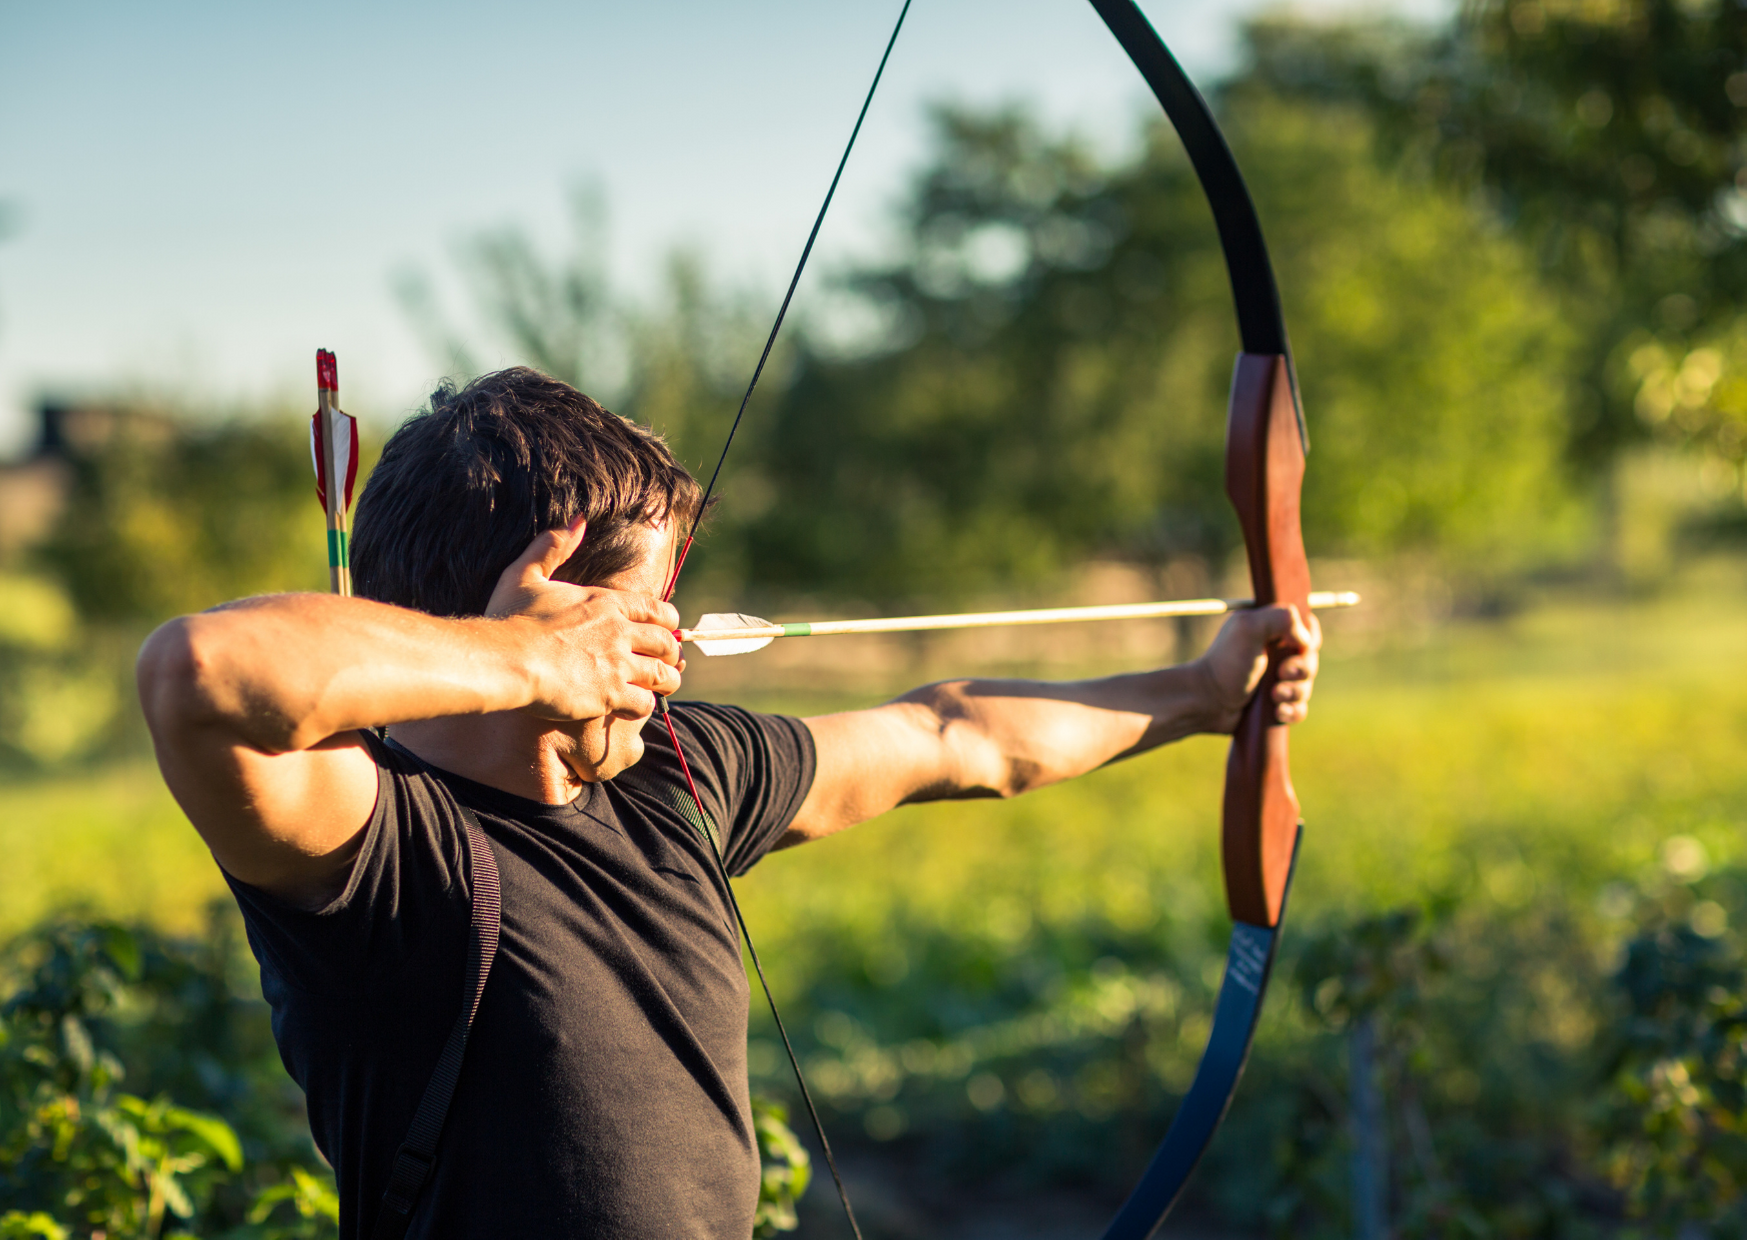 Playing archery